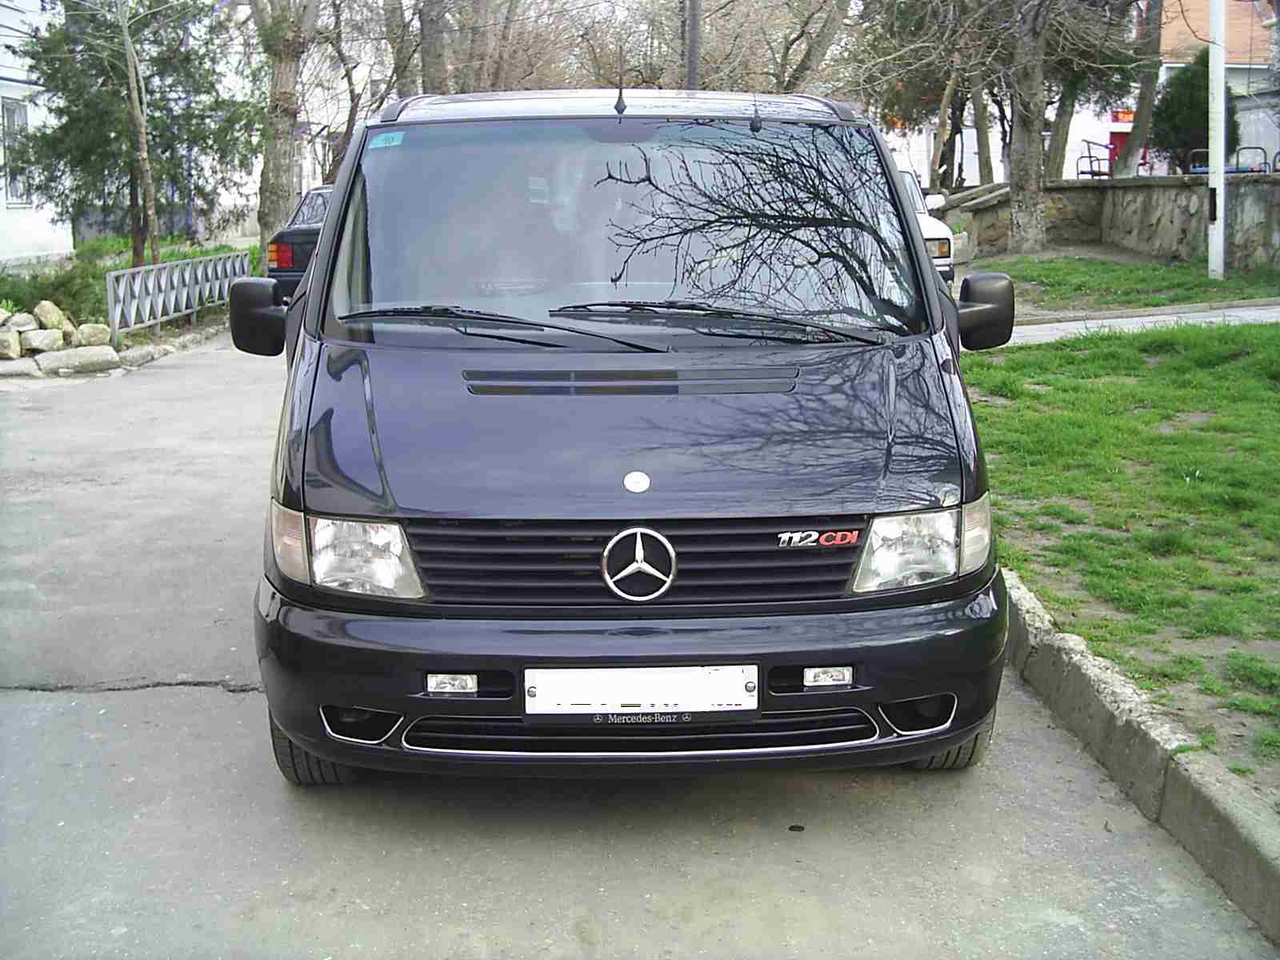 Used 2002 mercedes benz vito photos 2200cc diesel ff for Mercedes benz vito for sale